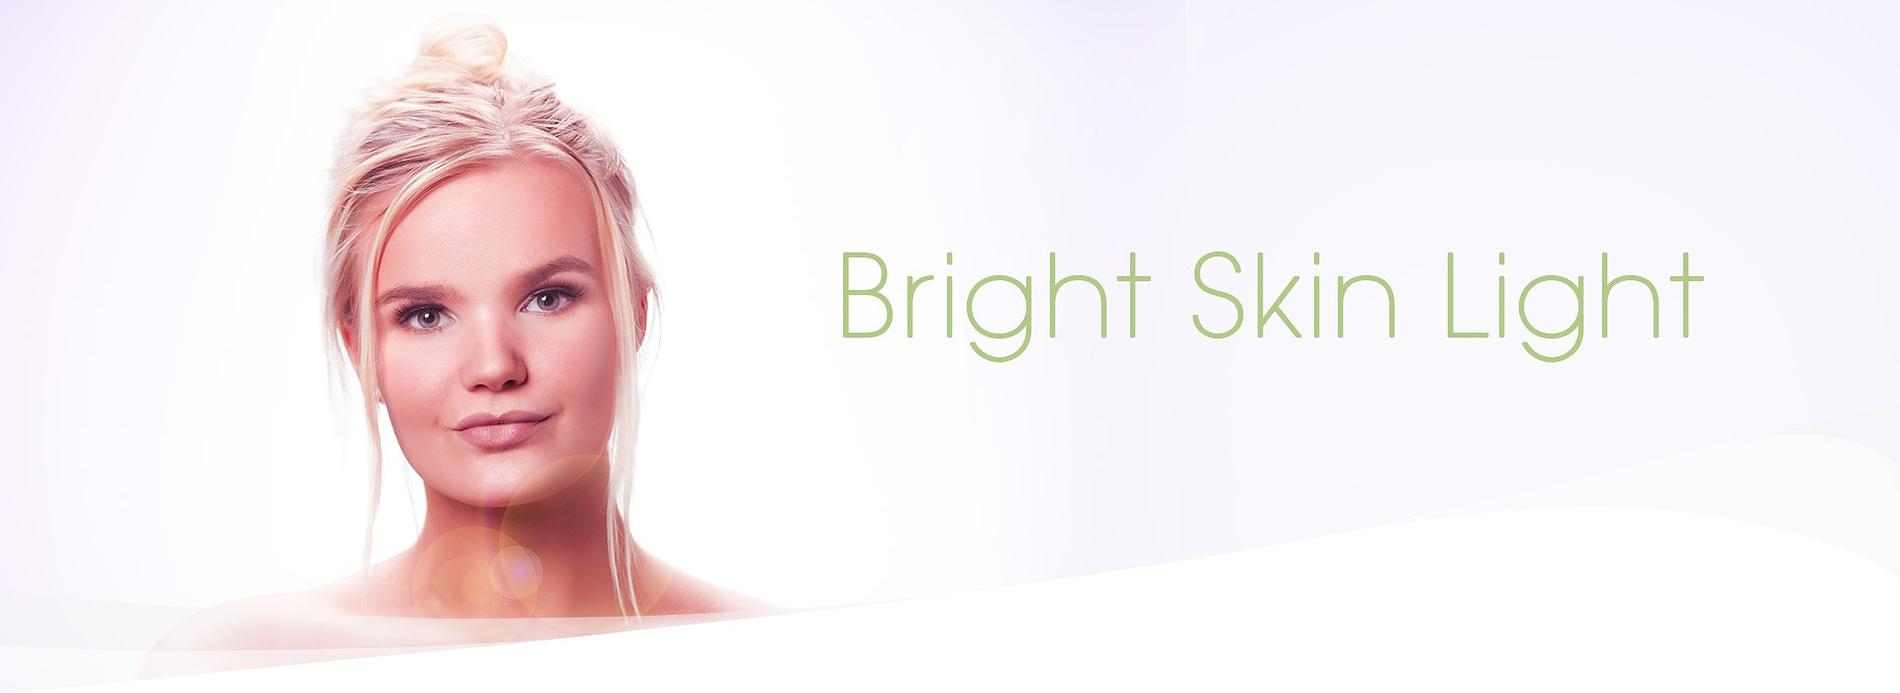 Dr. Muller header Bright Skin Light research